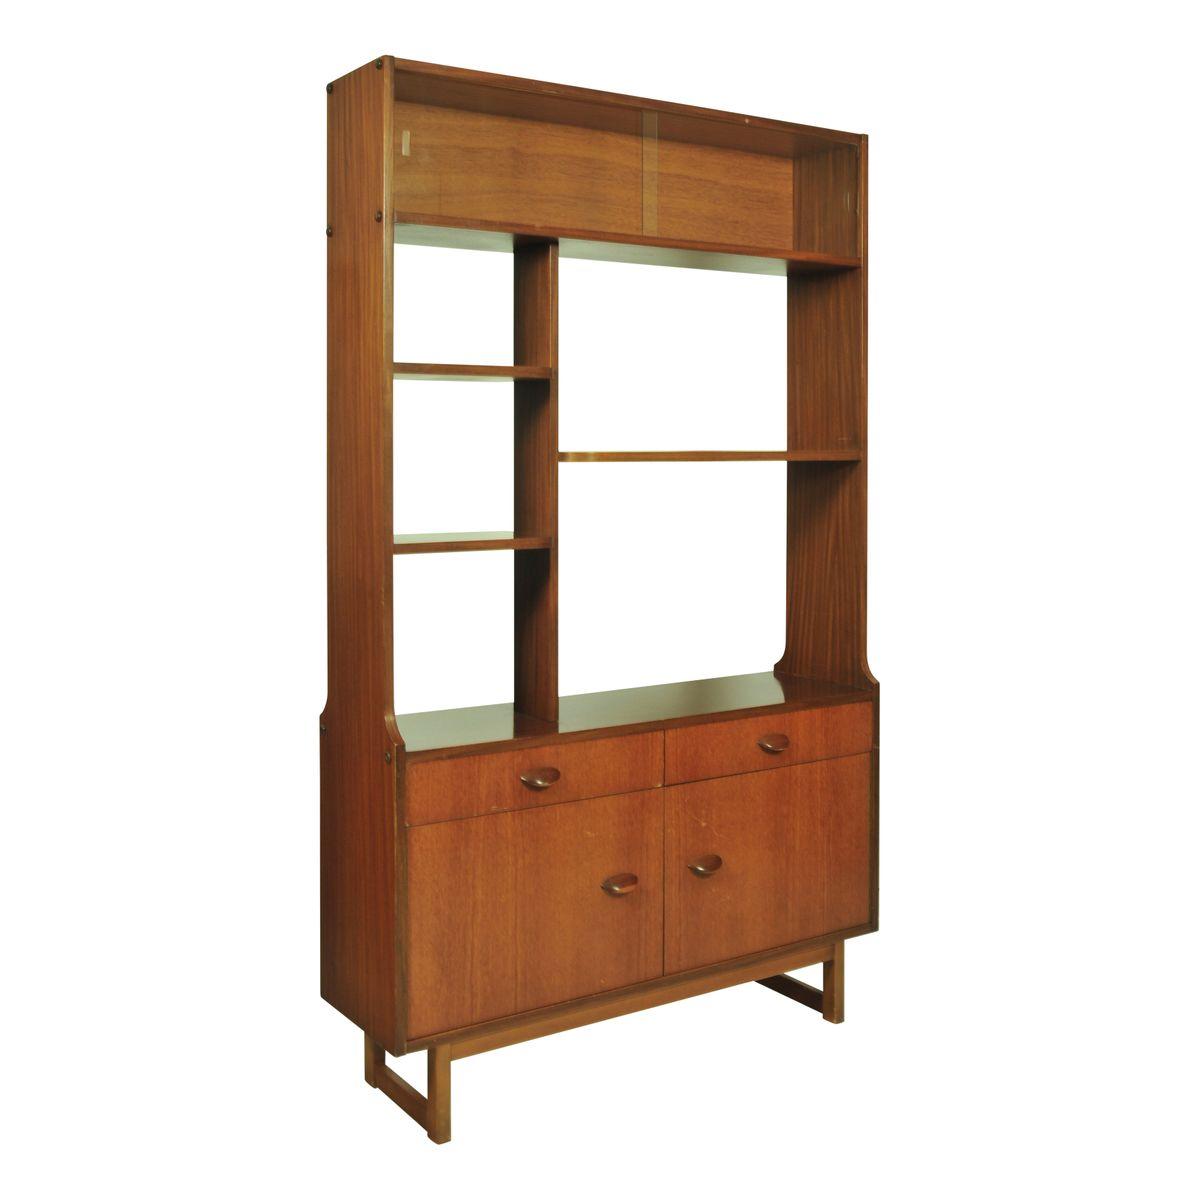 Teak Room Divider or Shelving Unit 1960s for sale at Pamono